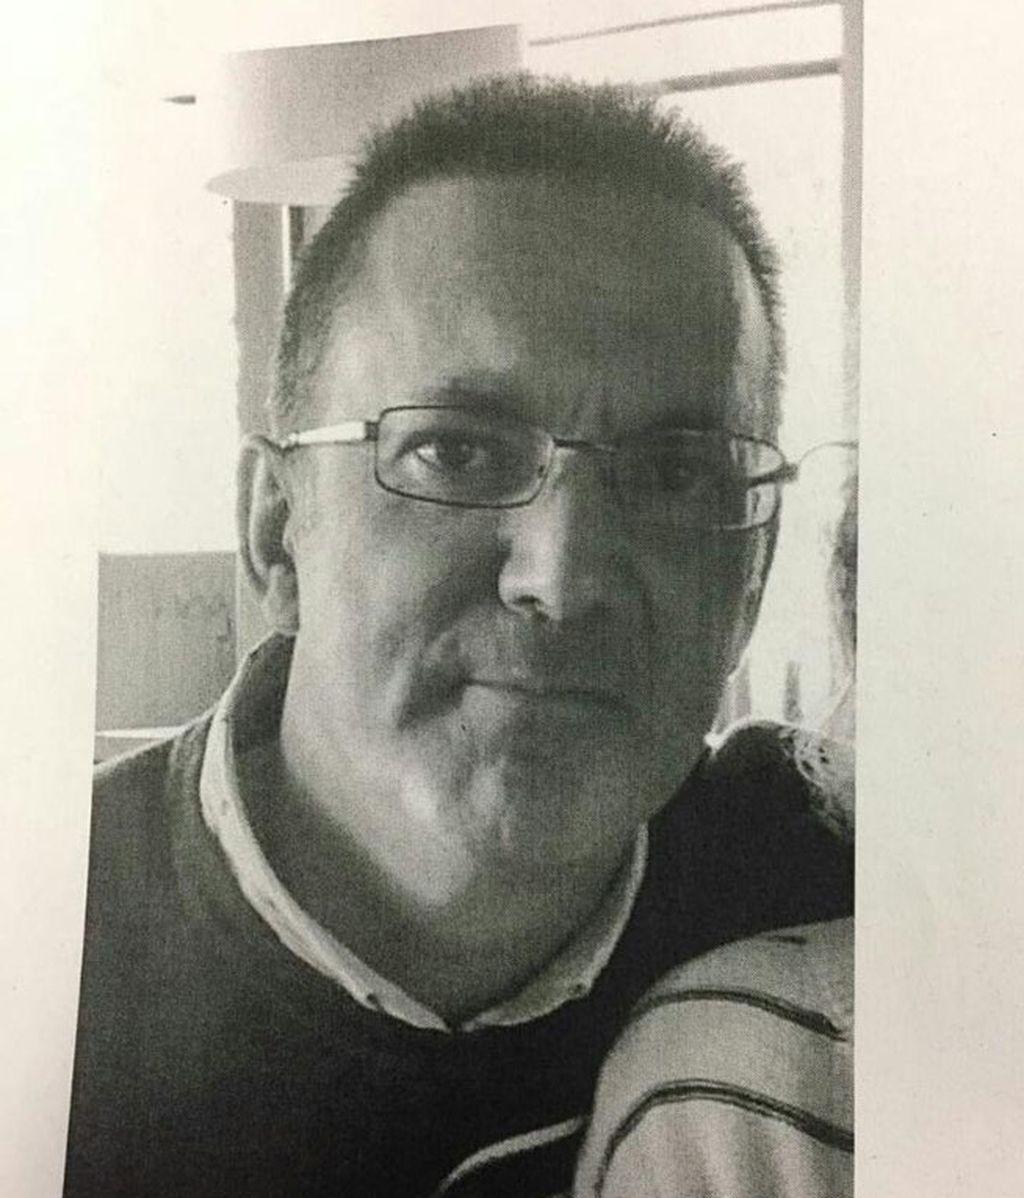 Se busca a un guardia civil desaparecido en el municipio sevillano de Utrera